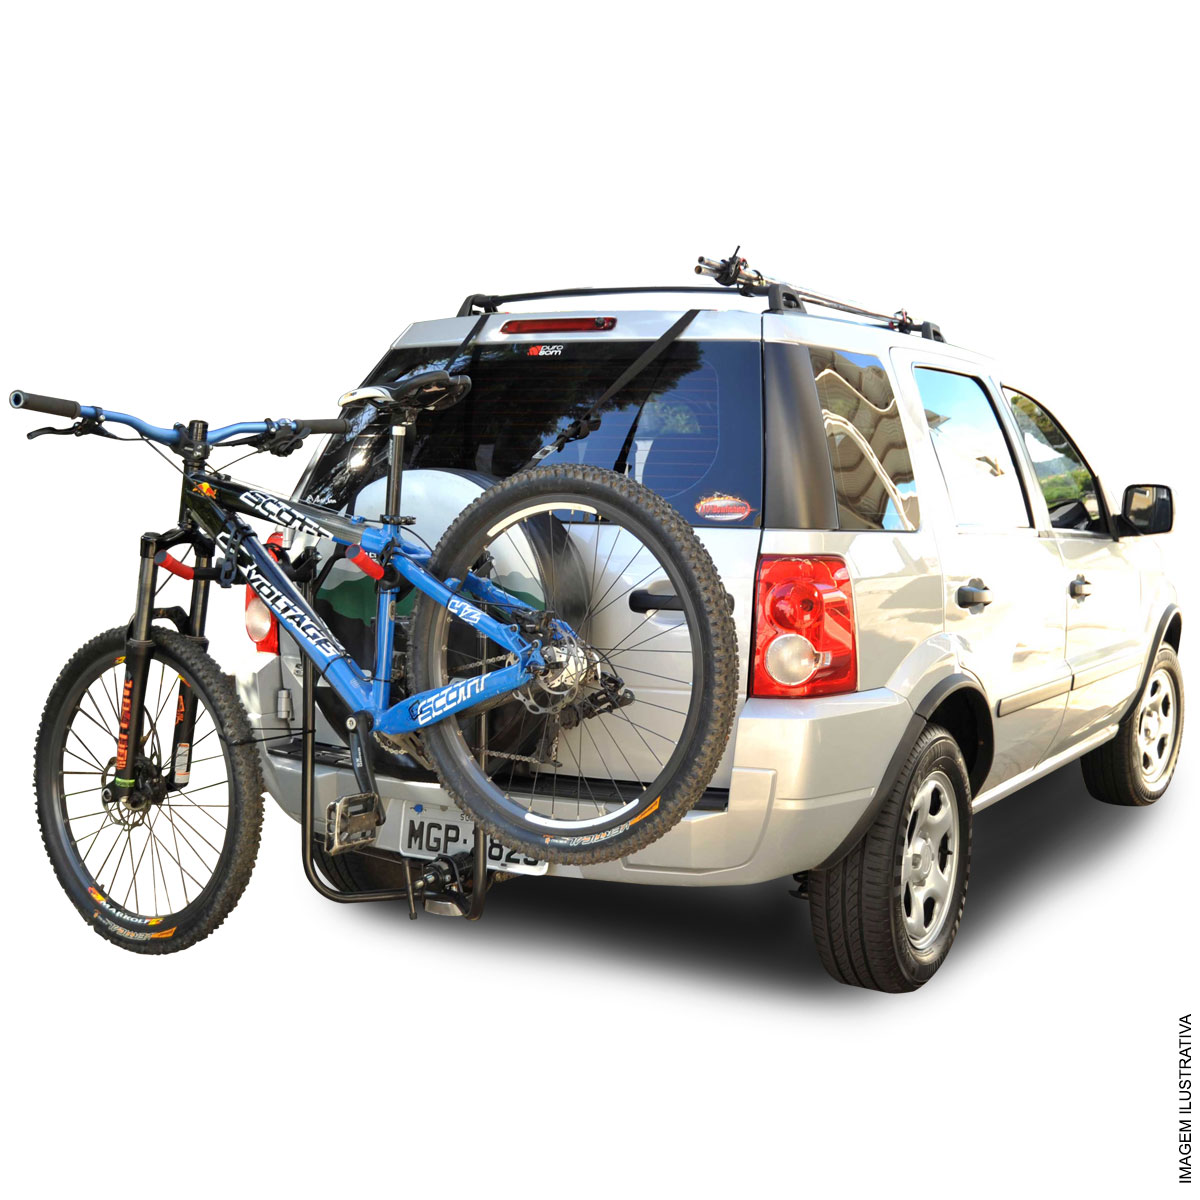 Transbike Ecosport 2003 a 2017 fixado no engate de reboque para 3 bicicletas